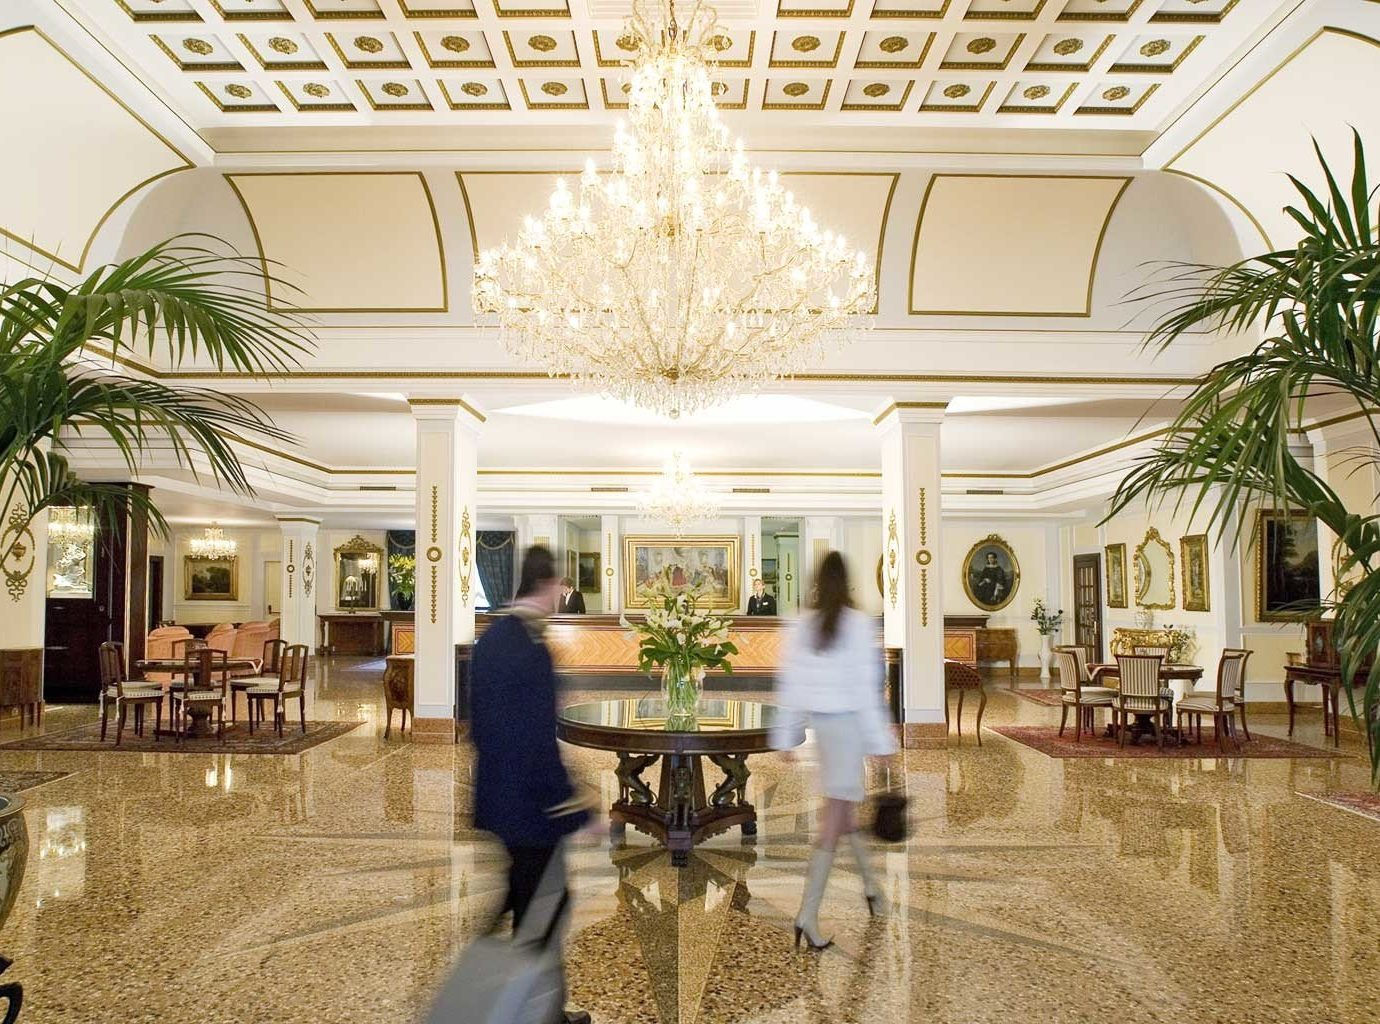 Classic Elegant Lobby plant building plaza palace Courtyard home mansion shopping mall ballroom